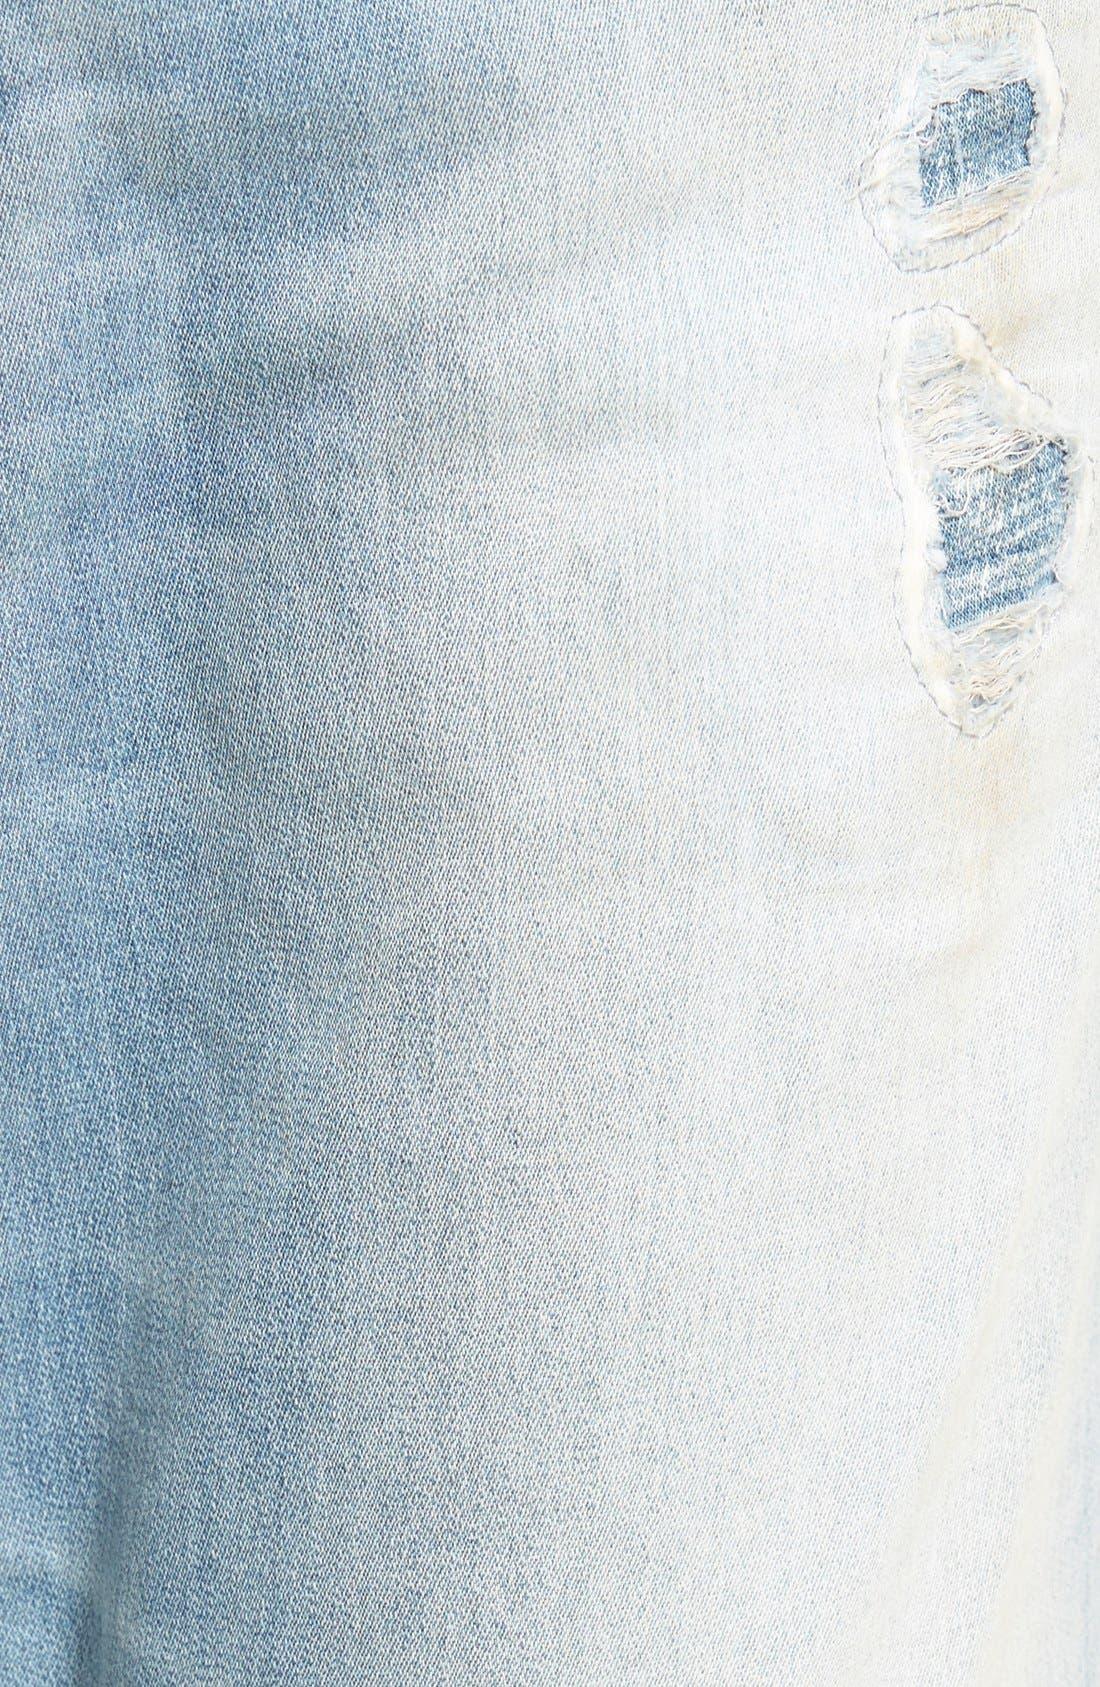 'Spender' Skinny Fit Jeans,                             Alternate thumbnail 6, color,                             400